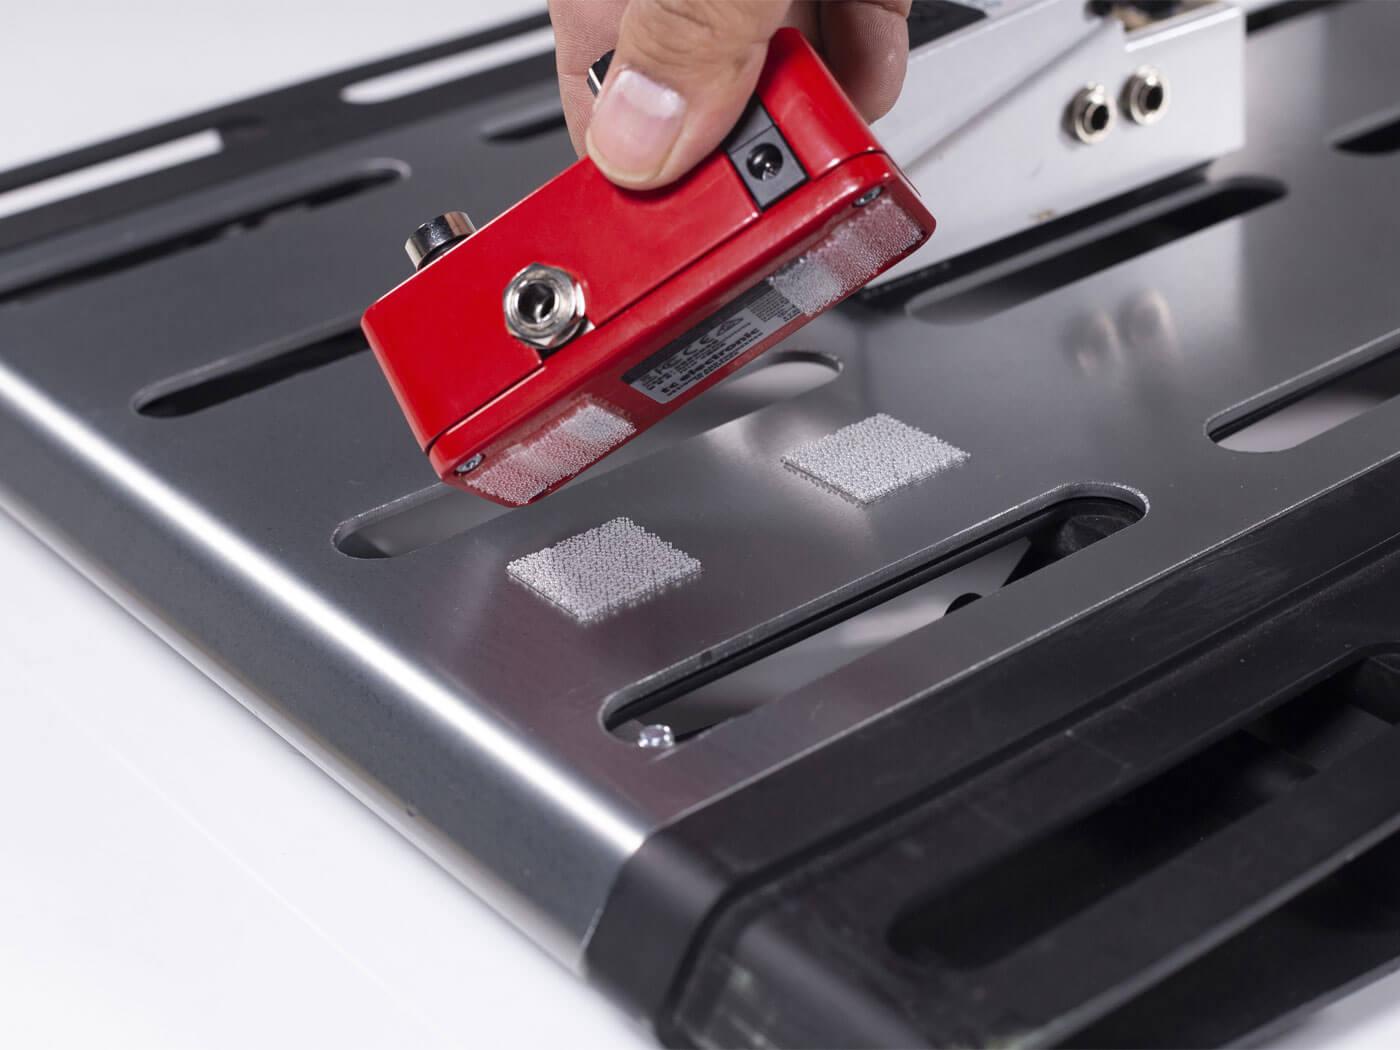 Gruv Gears LYNK fasteners